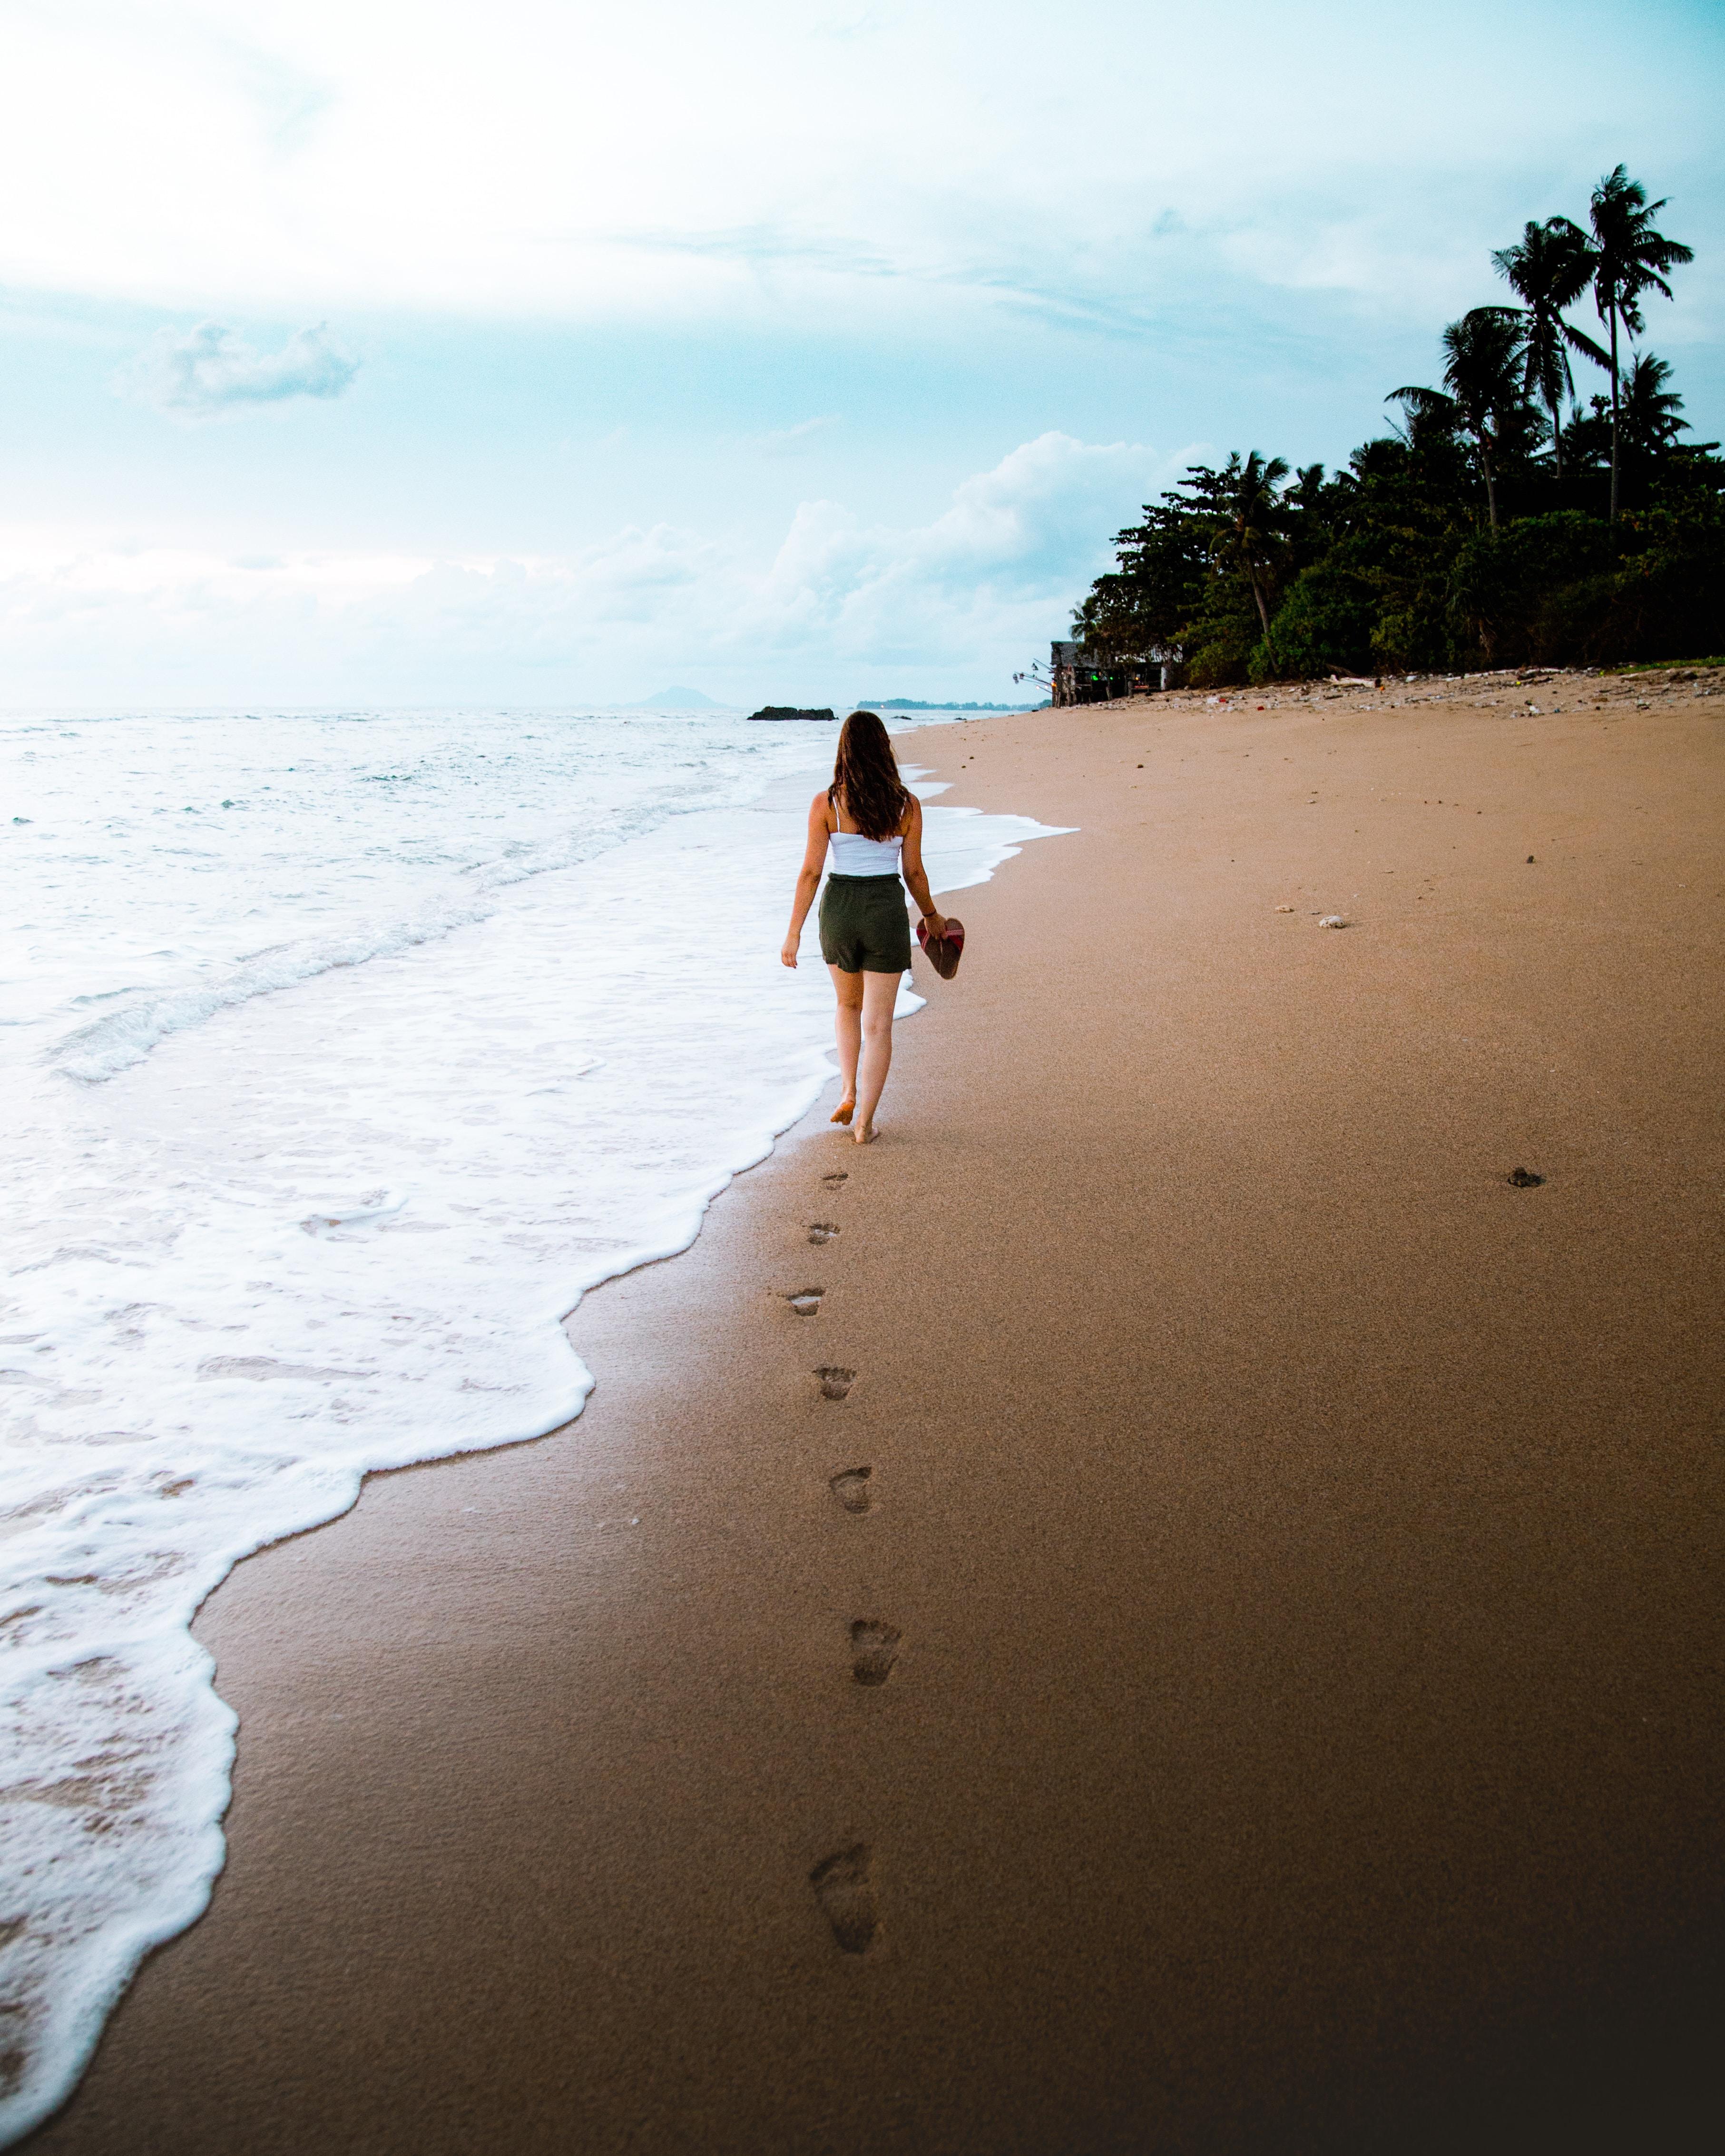 woman walking in front of beach